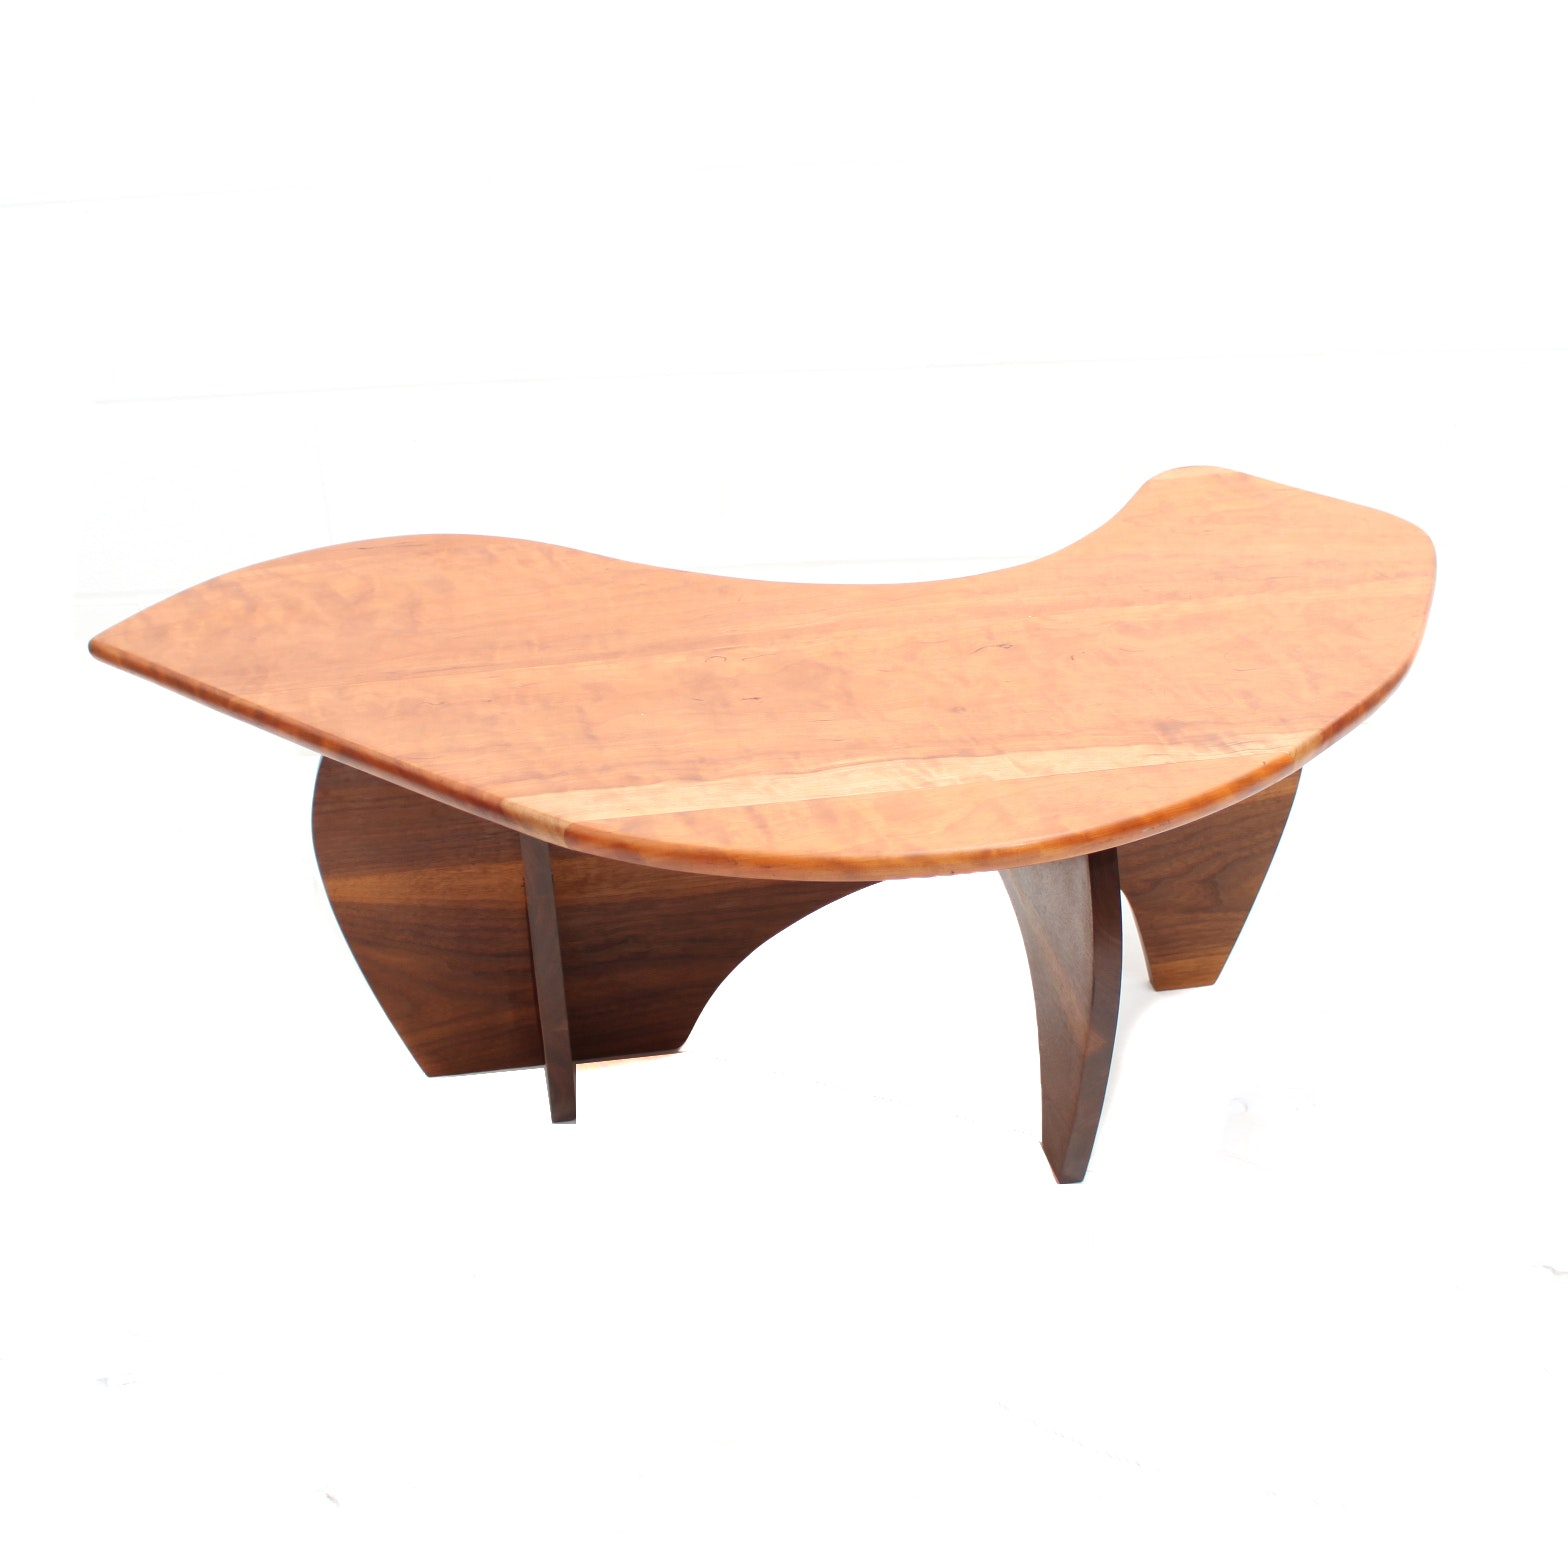 Mid Century Modern Style Biomorphic Cherry and Walnut Coffee Table